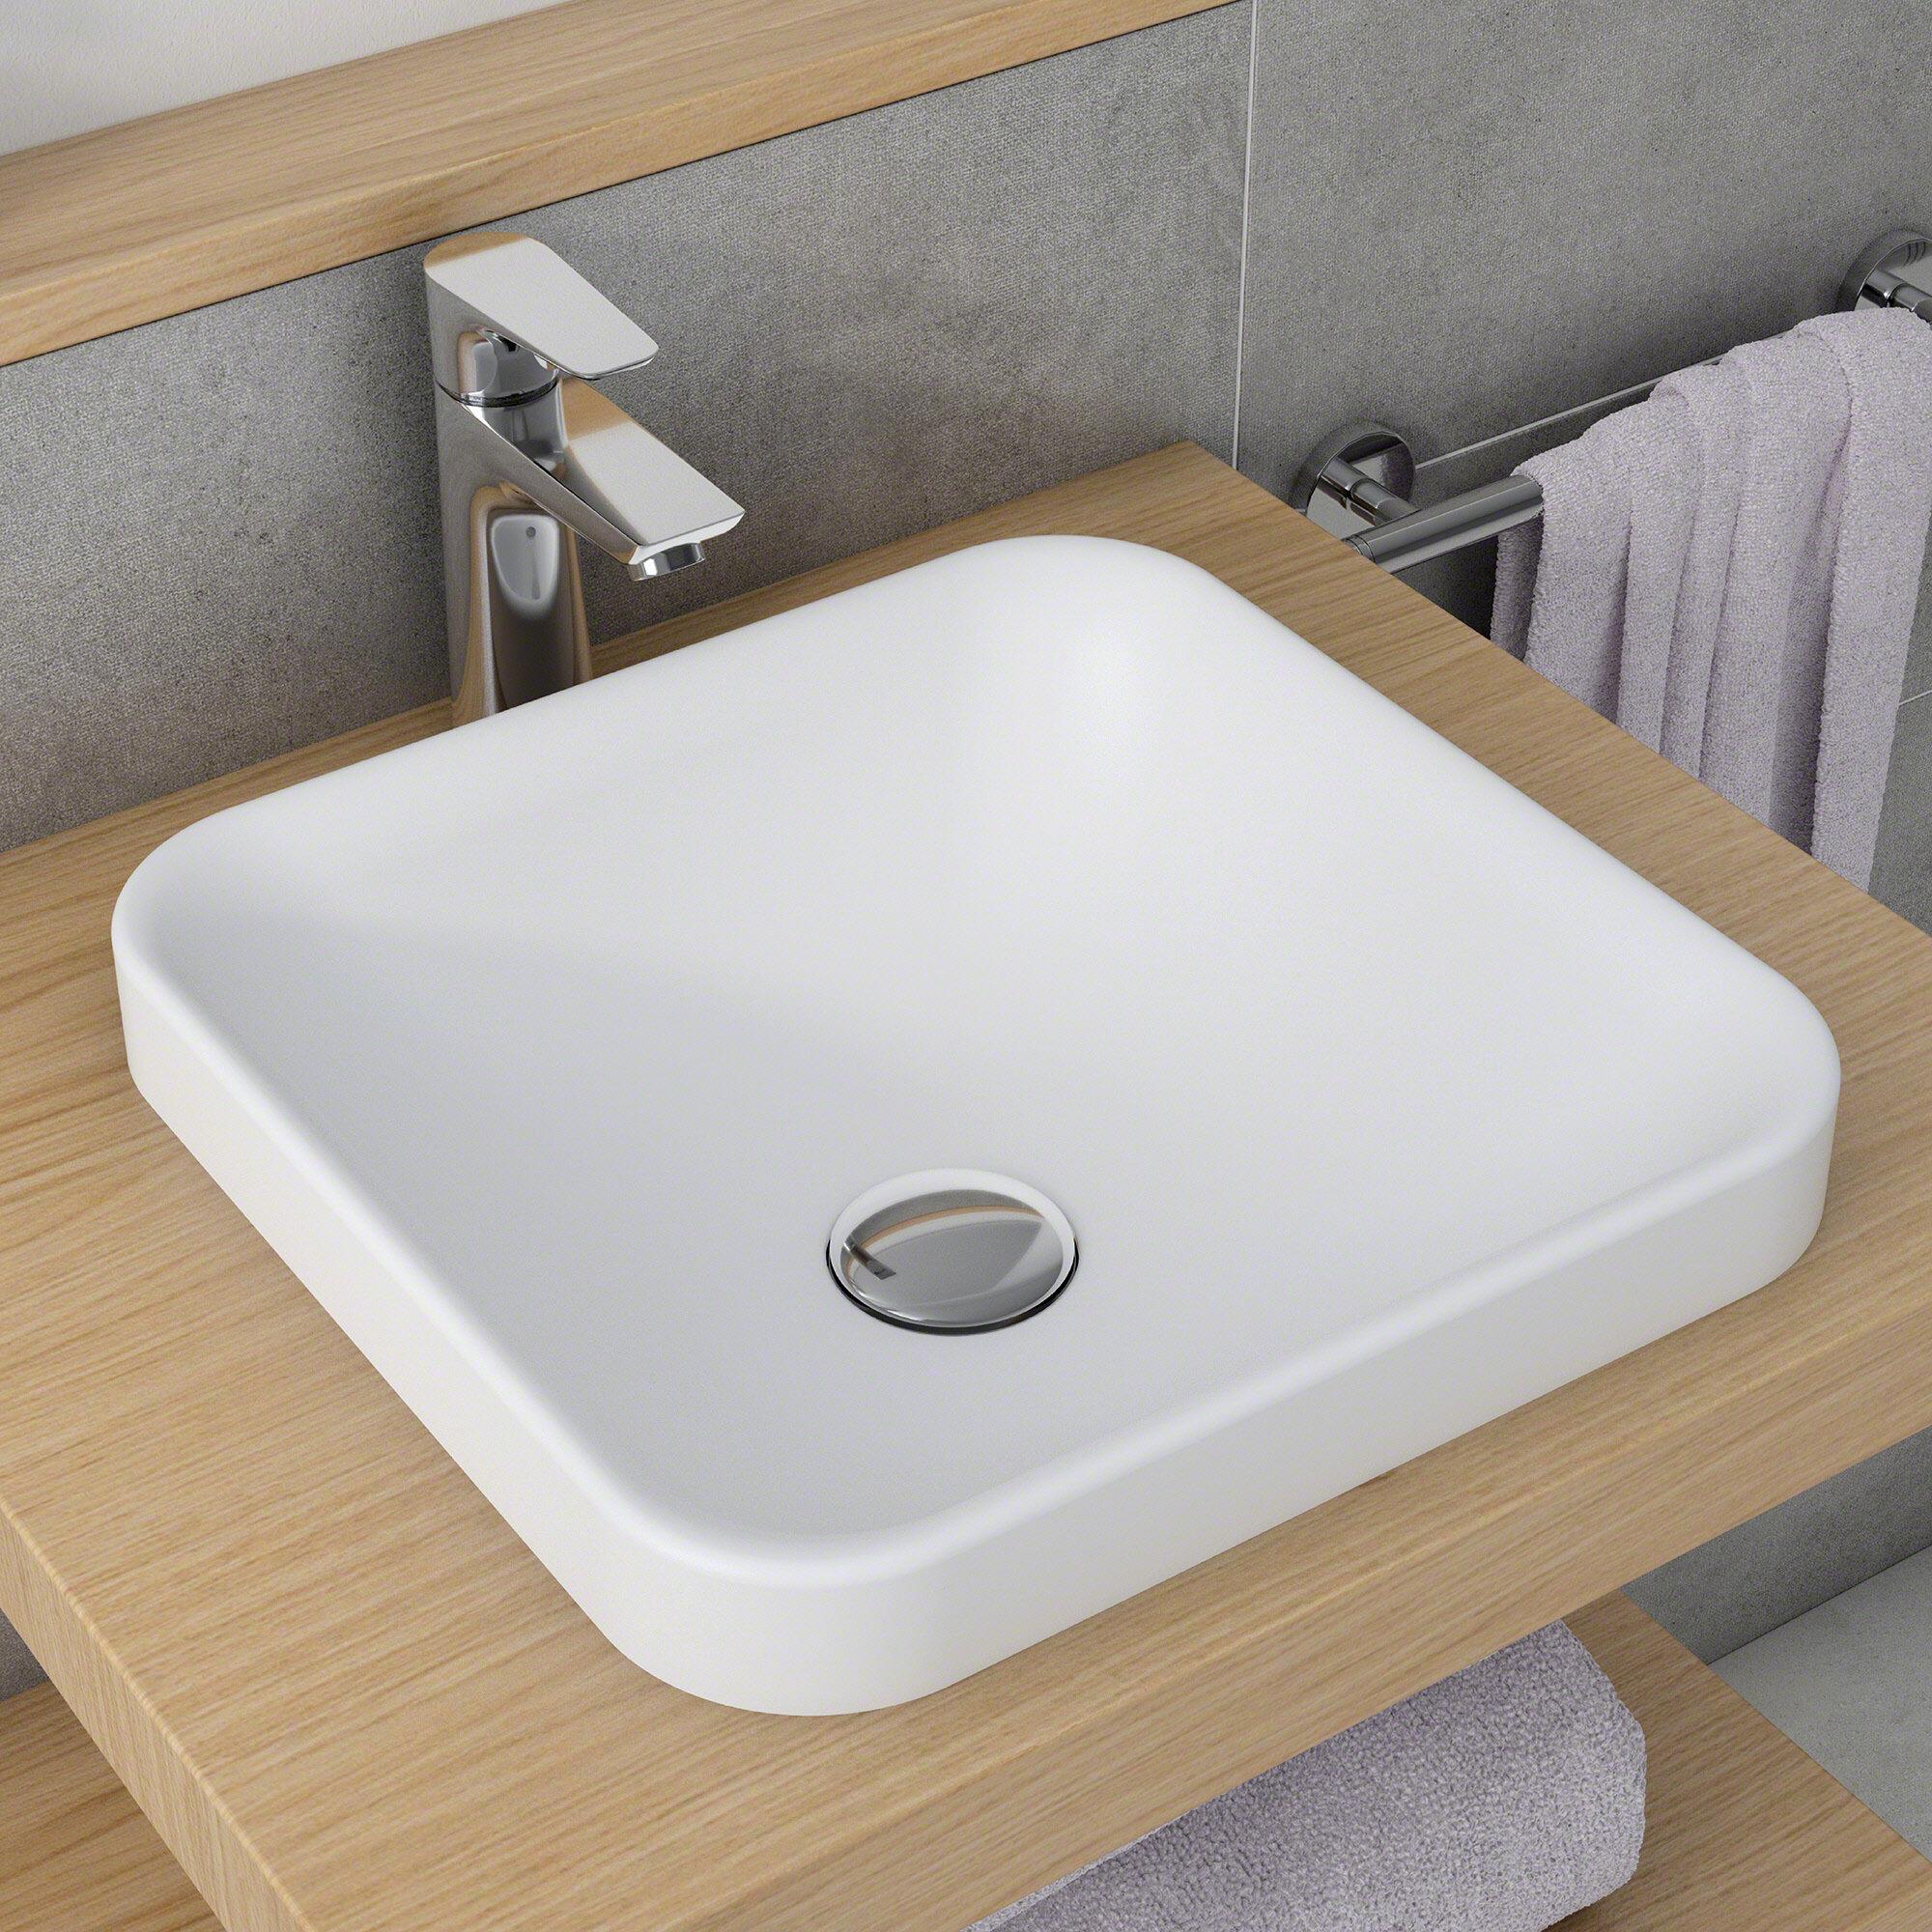 Ksr 9mw Natura Square Vessel Bathroom Sink